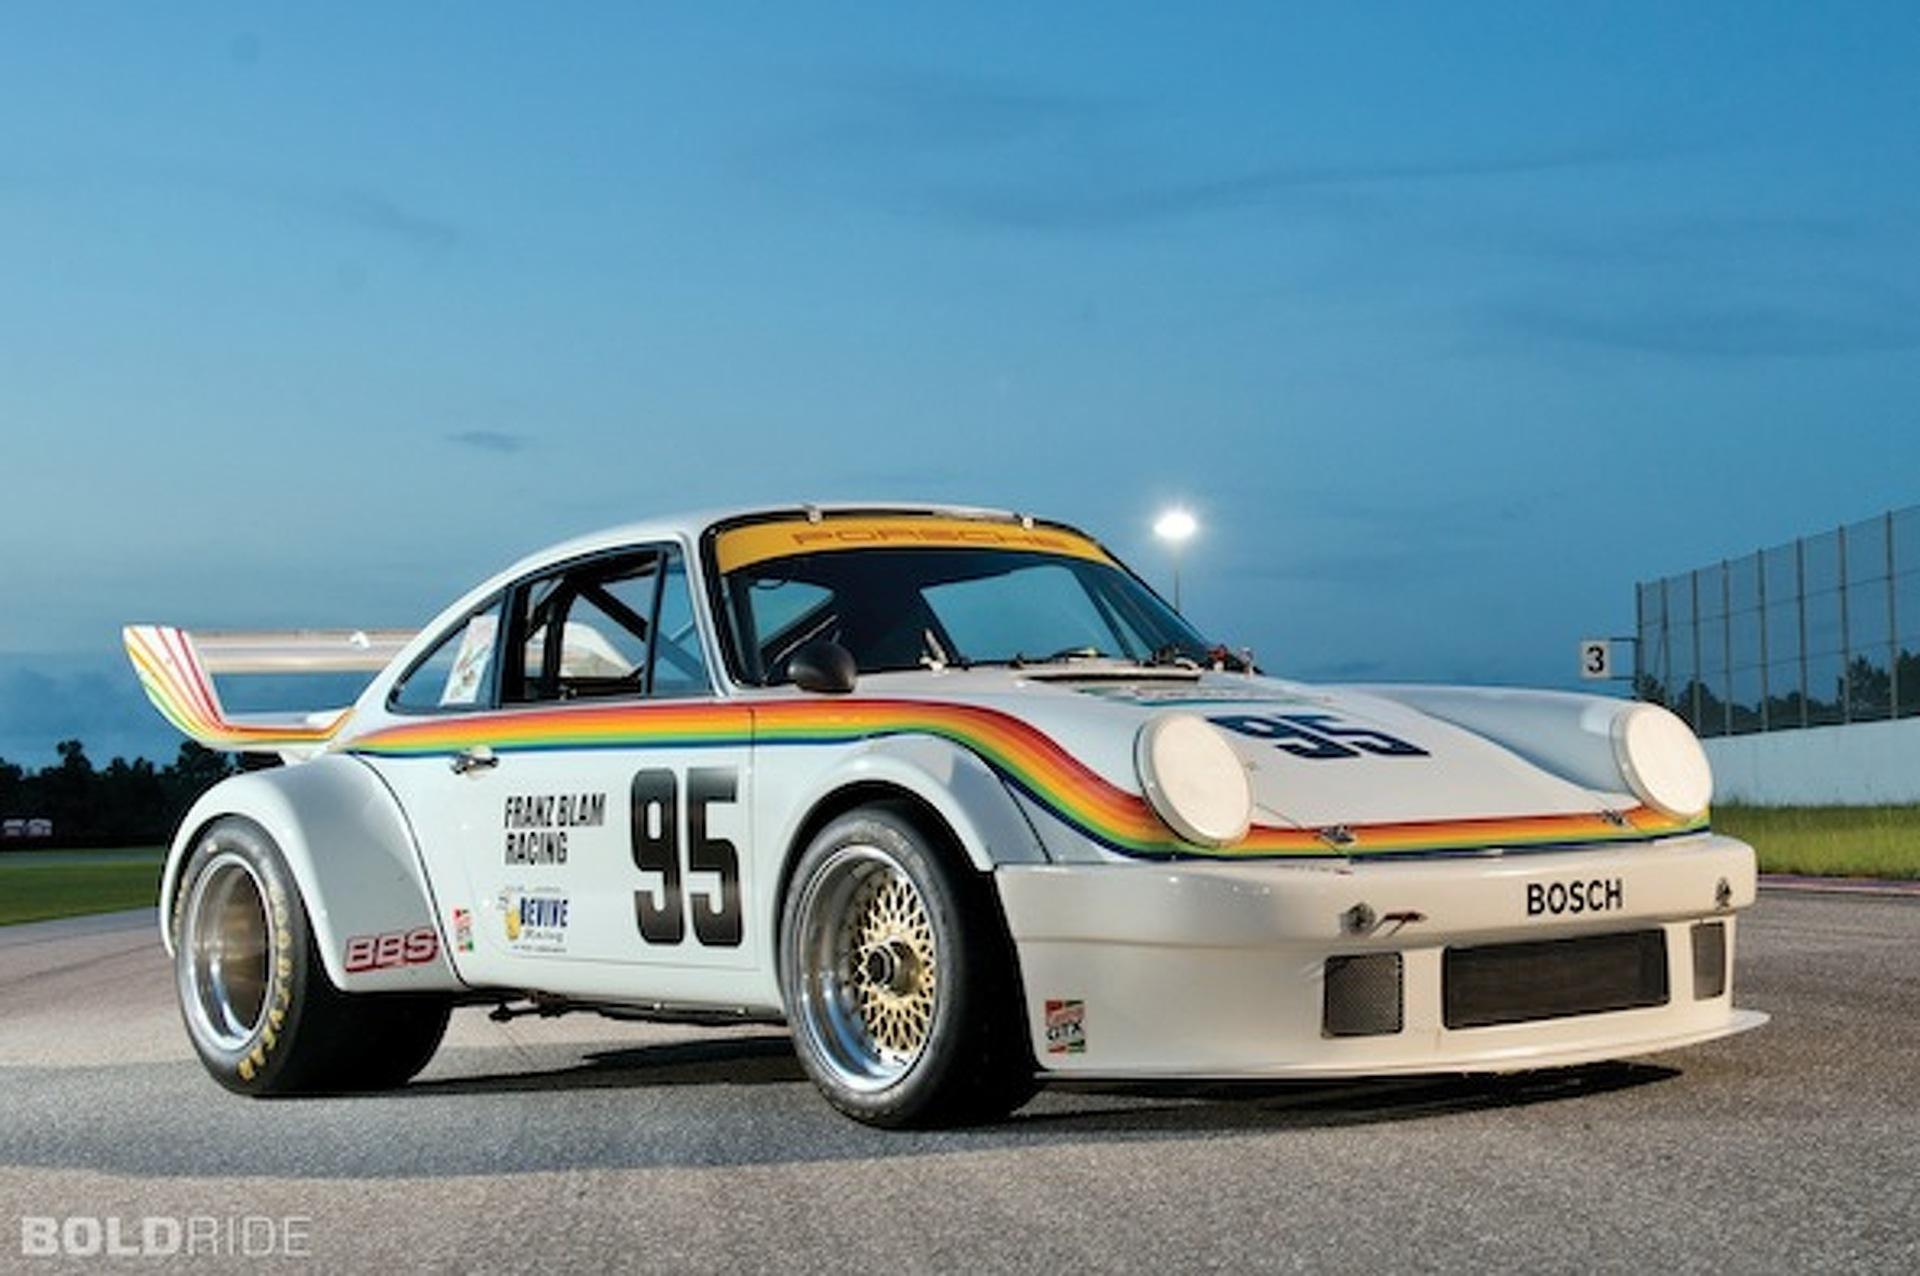 Wheels Wallpaper: 1977 Porsche 934 Turbo RSR